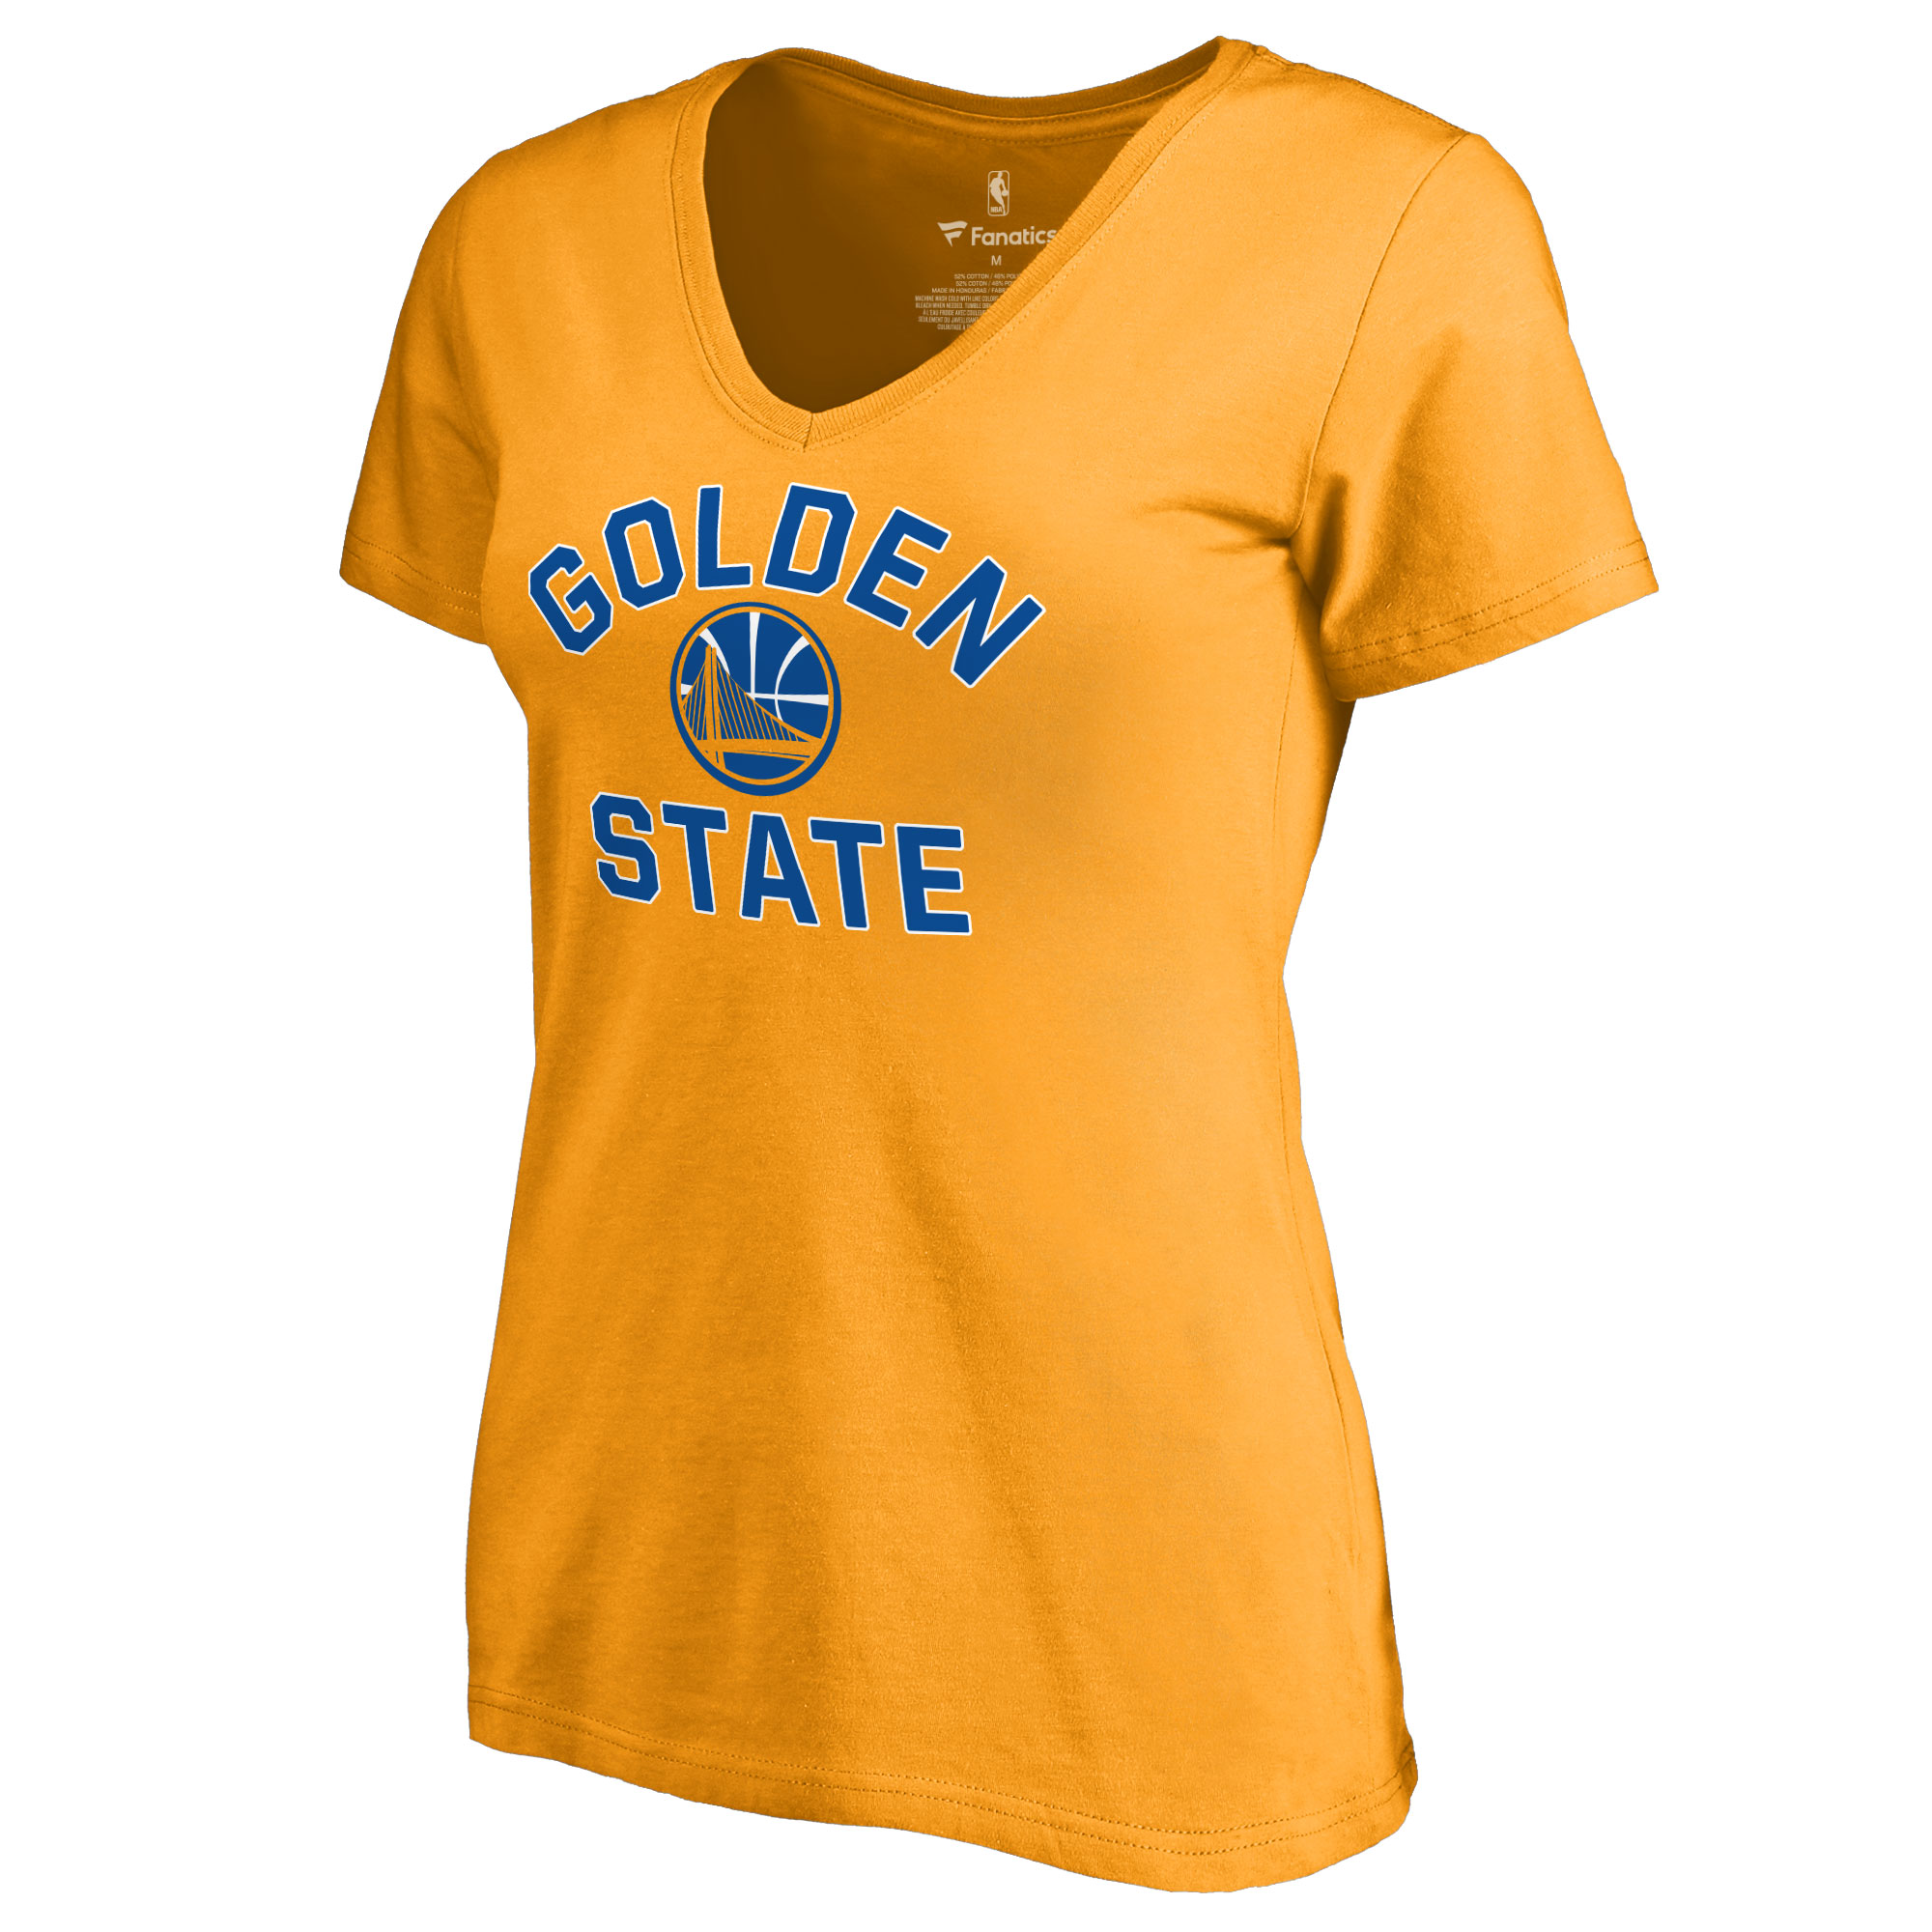 Golden State Warriors Women's Overtime T-Shirt - Gold